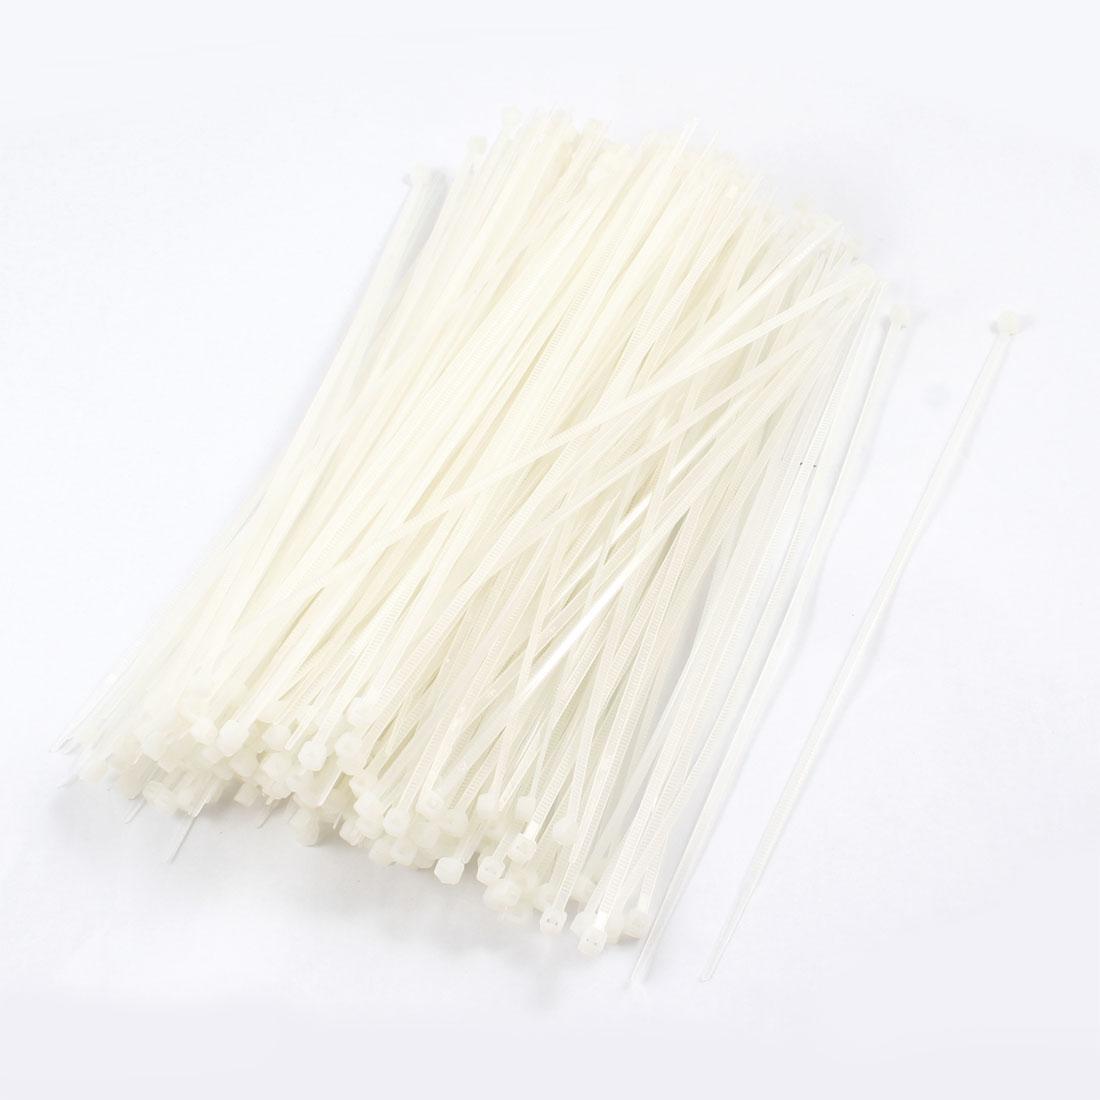 500 Pcs 3x180mm Locking Nylon Fastener Pack Cable Zip Tie Teeth Grip White